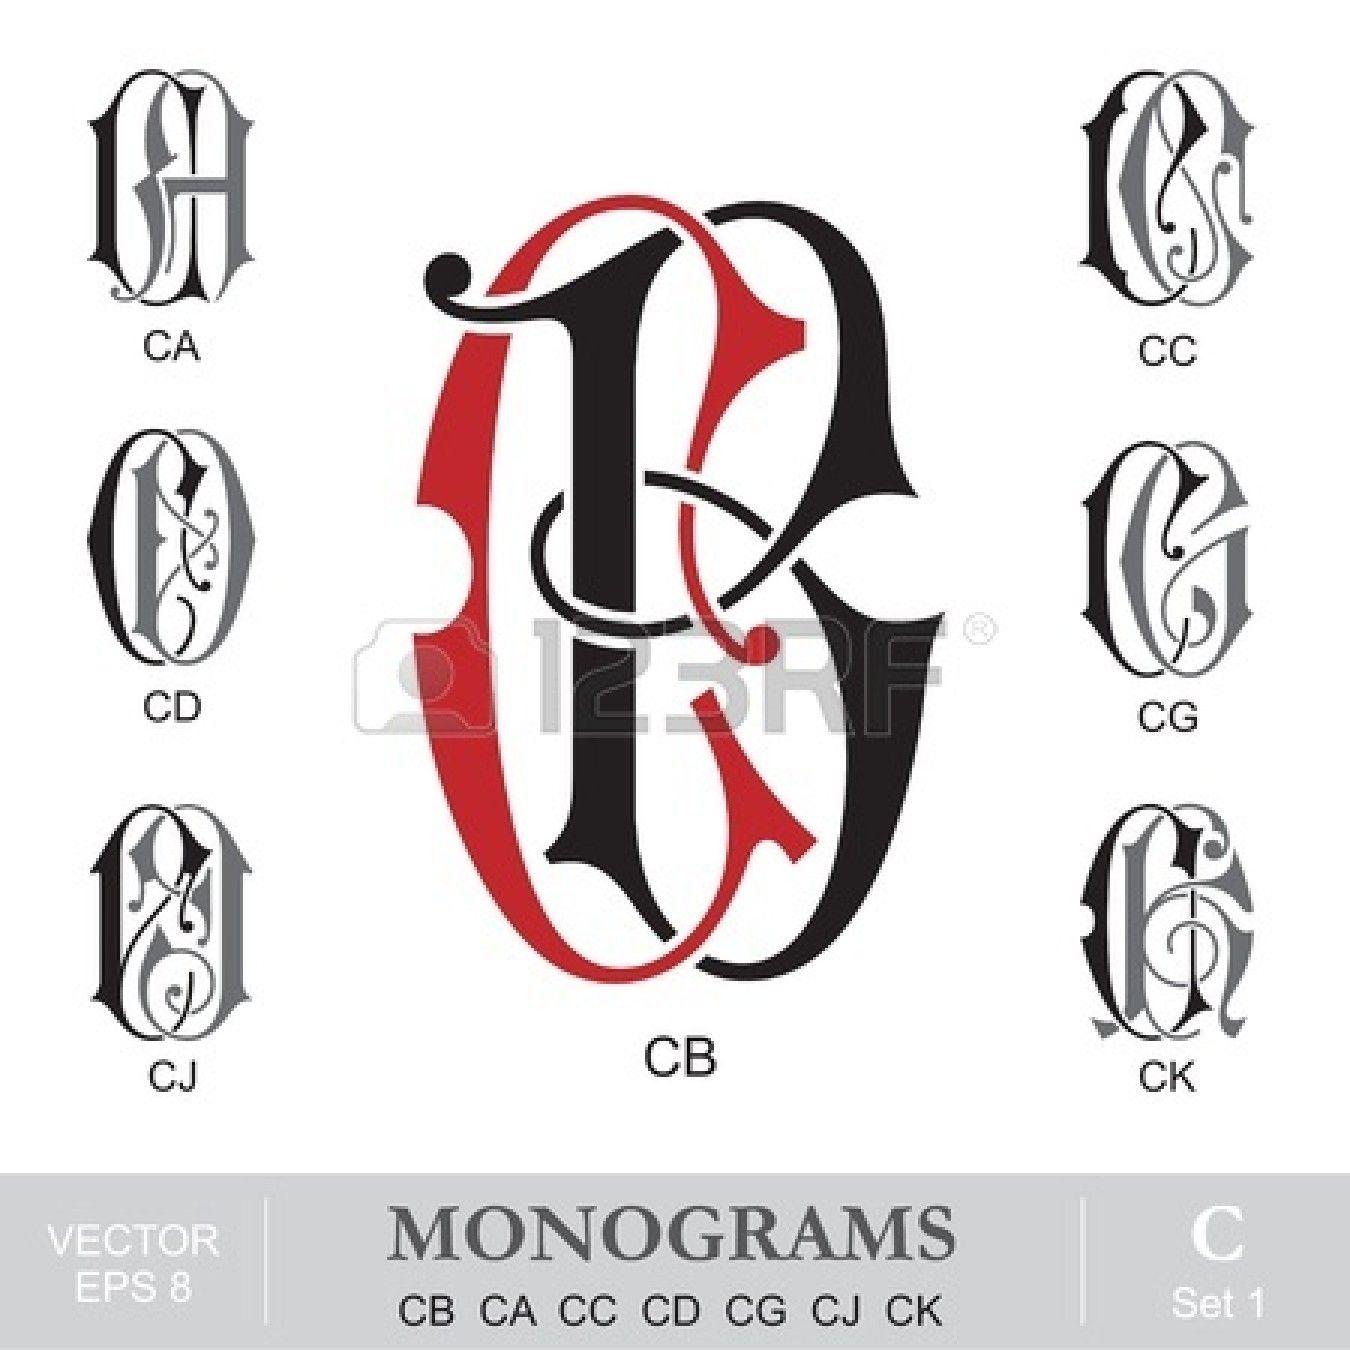 Vintage Monograms CB CA CC CD CG CJ CK | MONOGRAMS | Pinterest